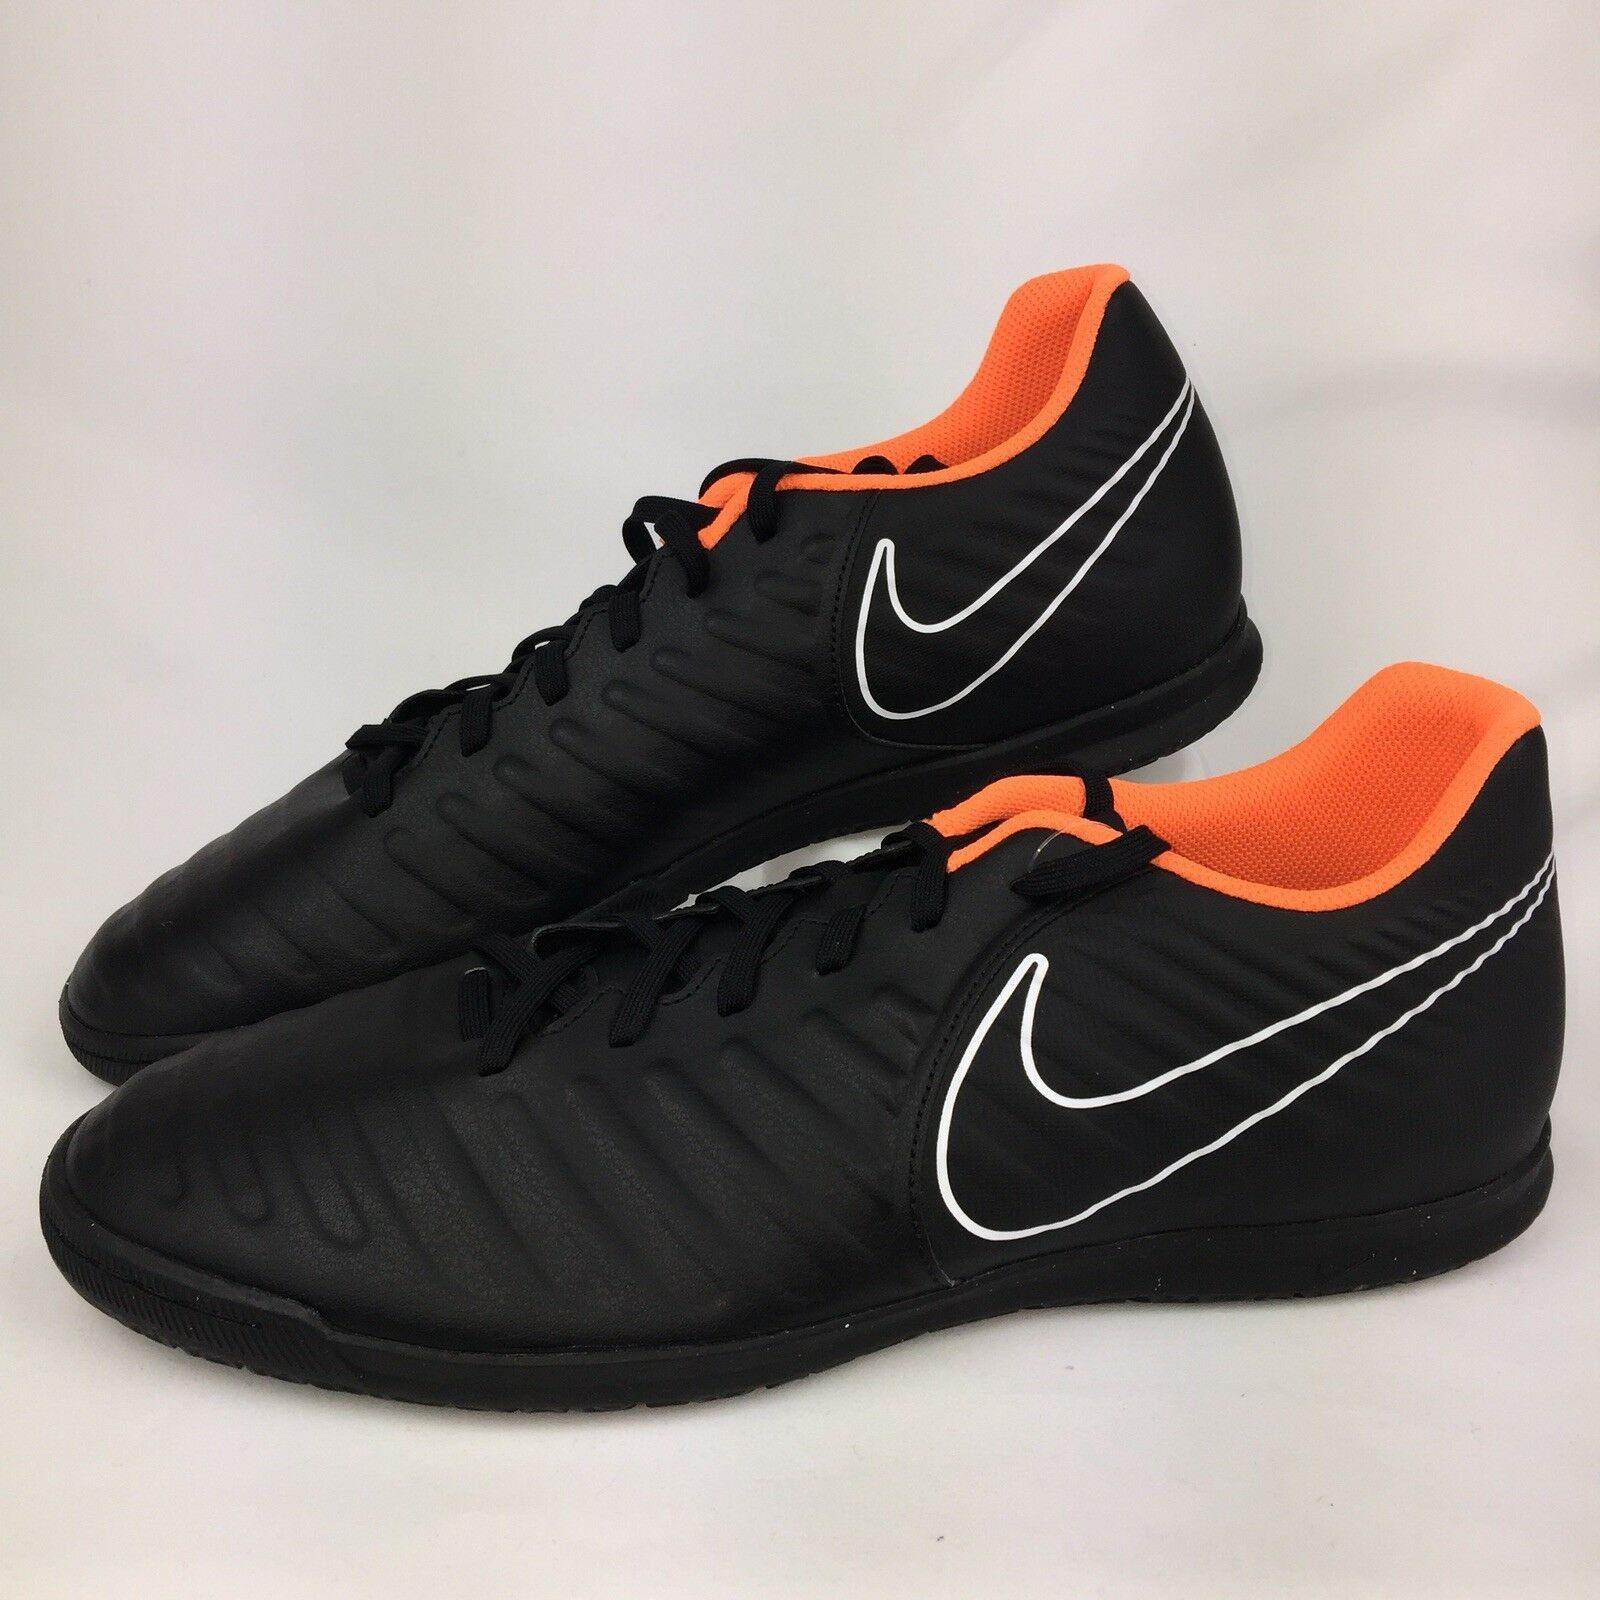 Nike TiempoX Legend VII Club IC New Soccer Sneaker Size 13